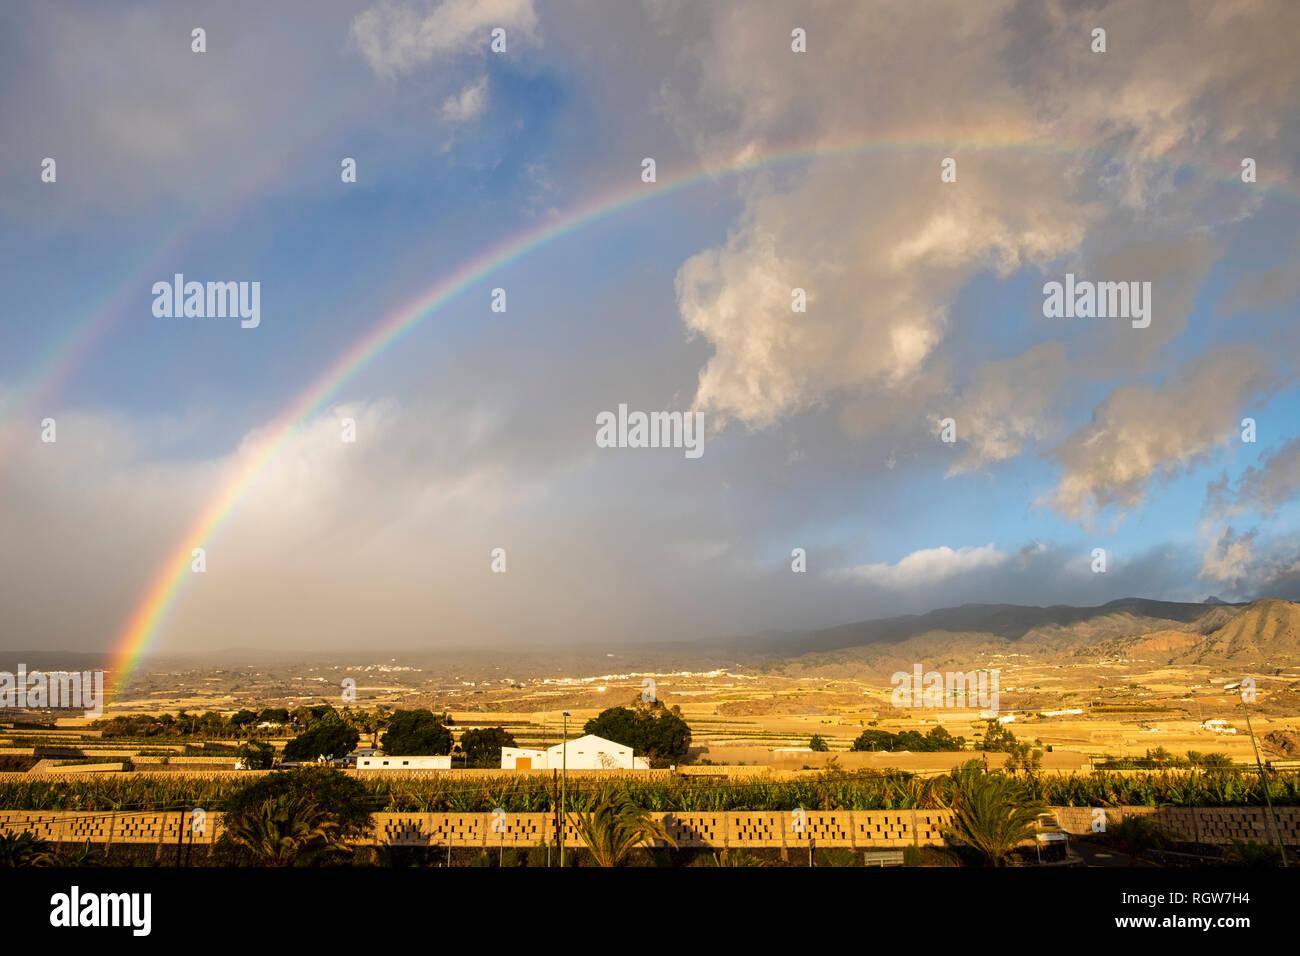 Colourful rainbow over banana plantations in Playa San Juan, Tenerife, Canary Islands, Spain - Stock Image